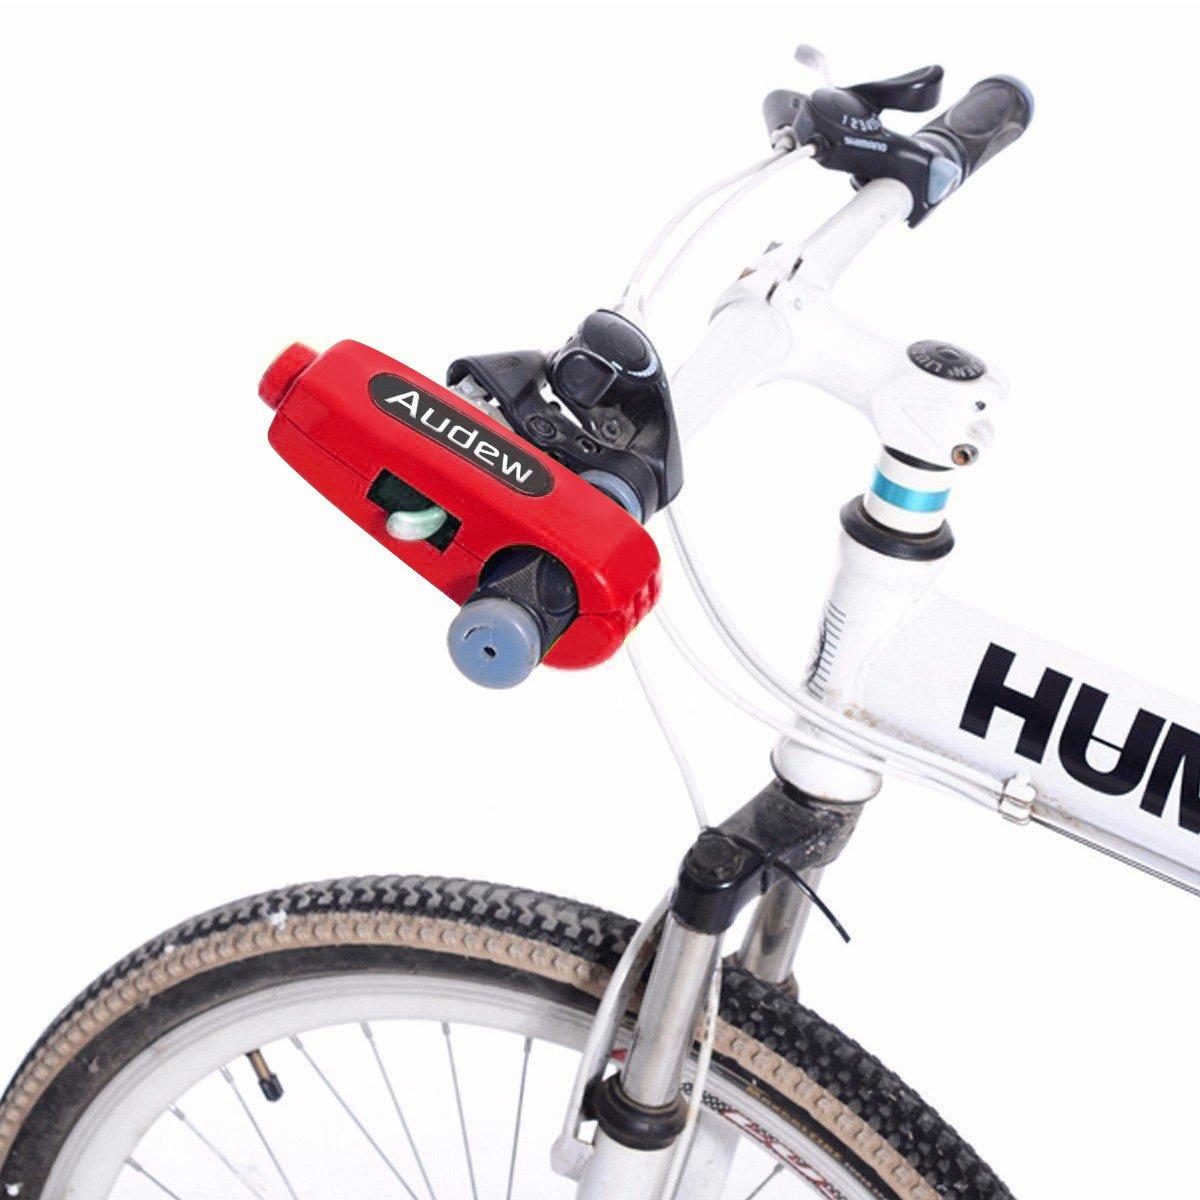 Audew Motocicleta/Scooter/ATV/Palanca de Freno para Manillar de Bicicleta antirrobo de Bloqueo, Bloqueo de Seguridad, Bloqueo de Puño del Acelerador: ...